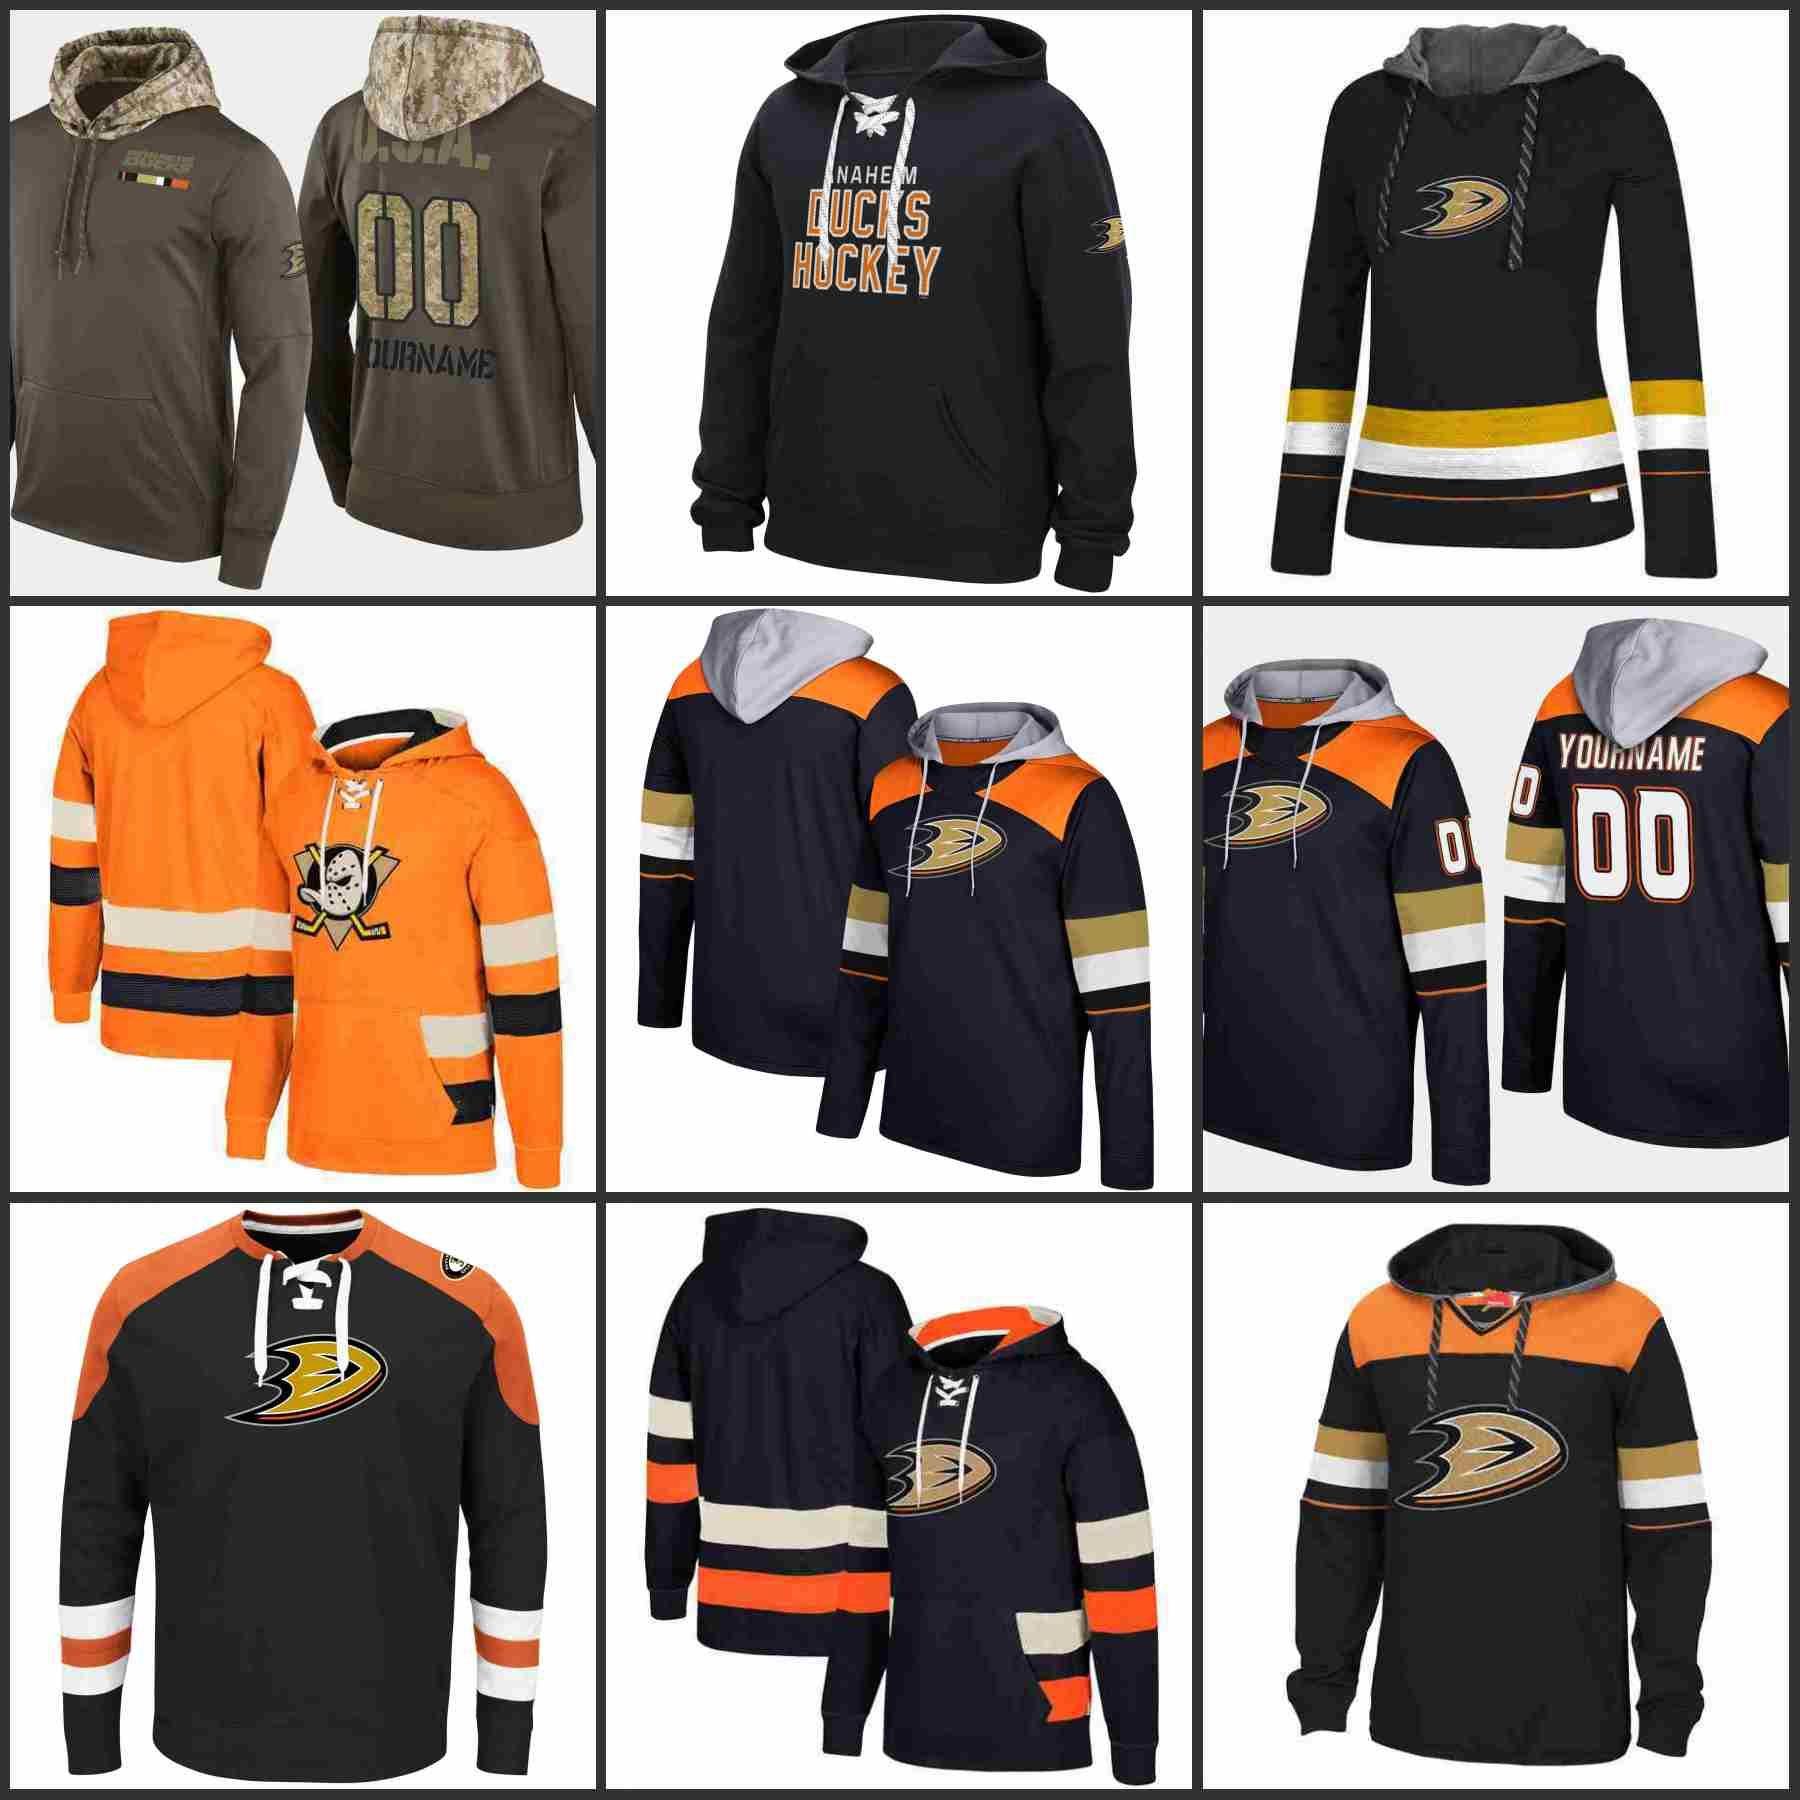 f0c23ac6e 2019 Anaheim Ducks Hoodies Teemu Selanne Paul Kariya Corey Perry Ryan  Getzlaf Hockey Jersey Sweatshirt Stitched From Jerseys_online, $42.85 |  DHgate.Com